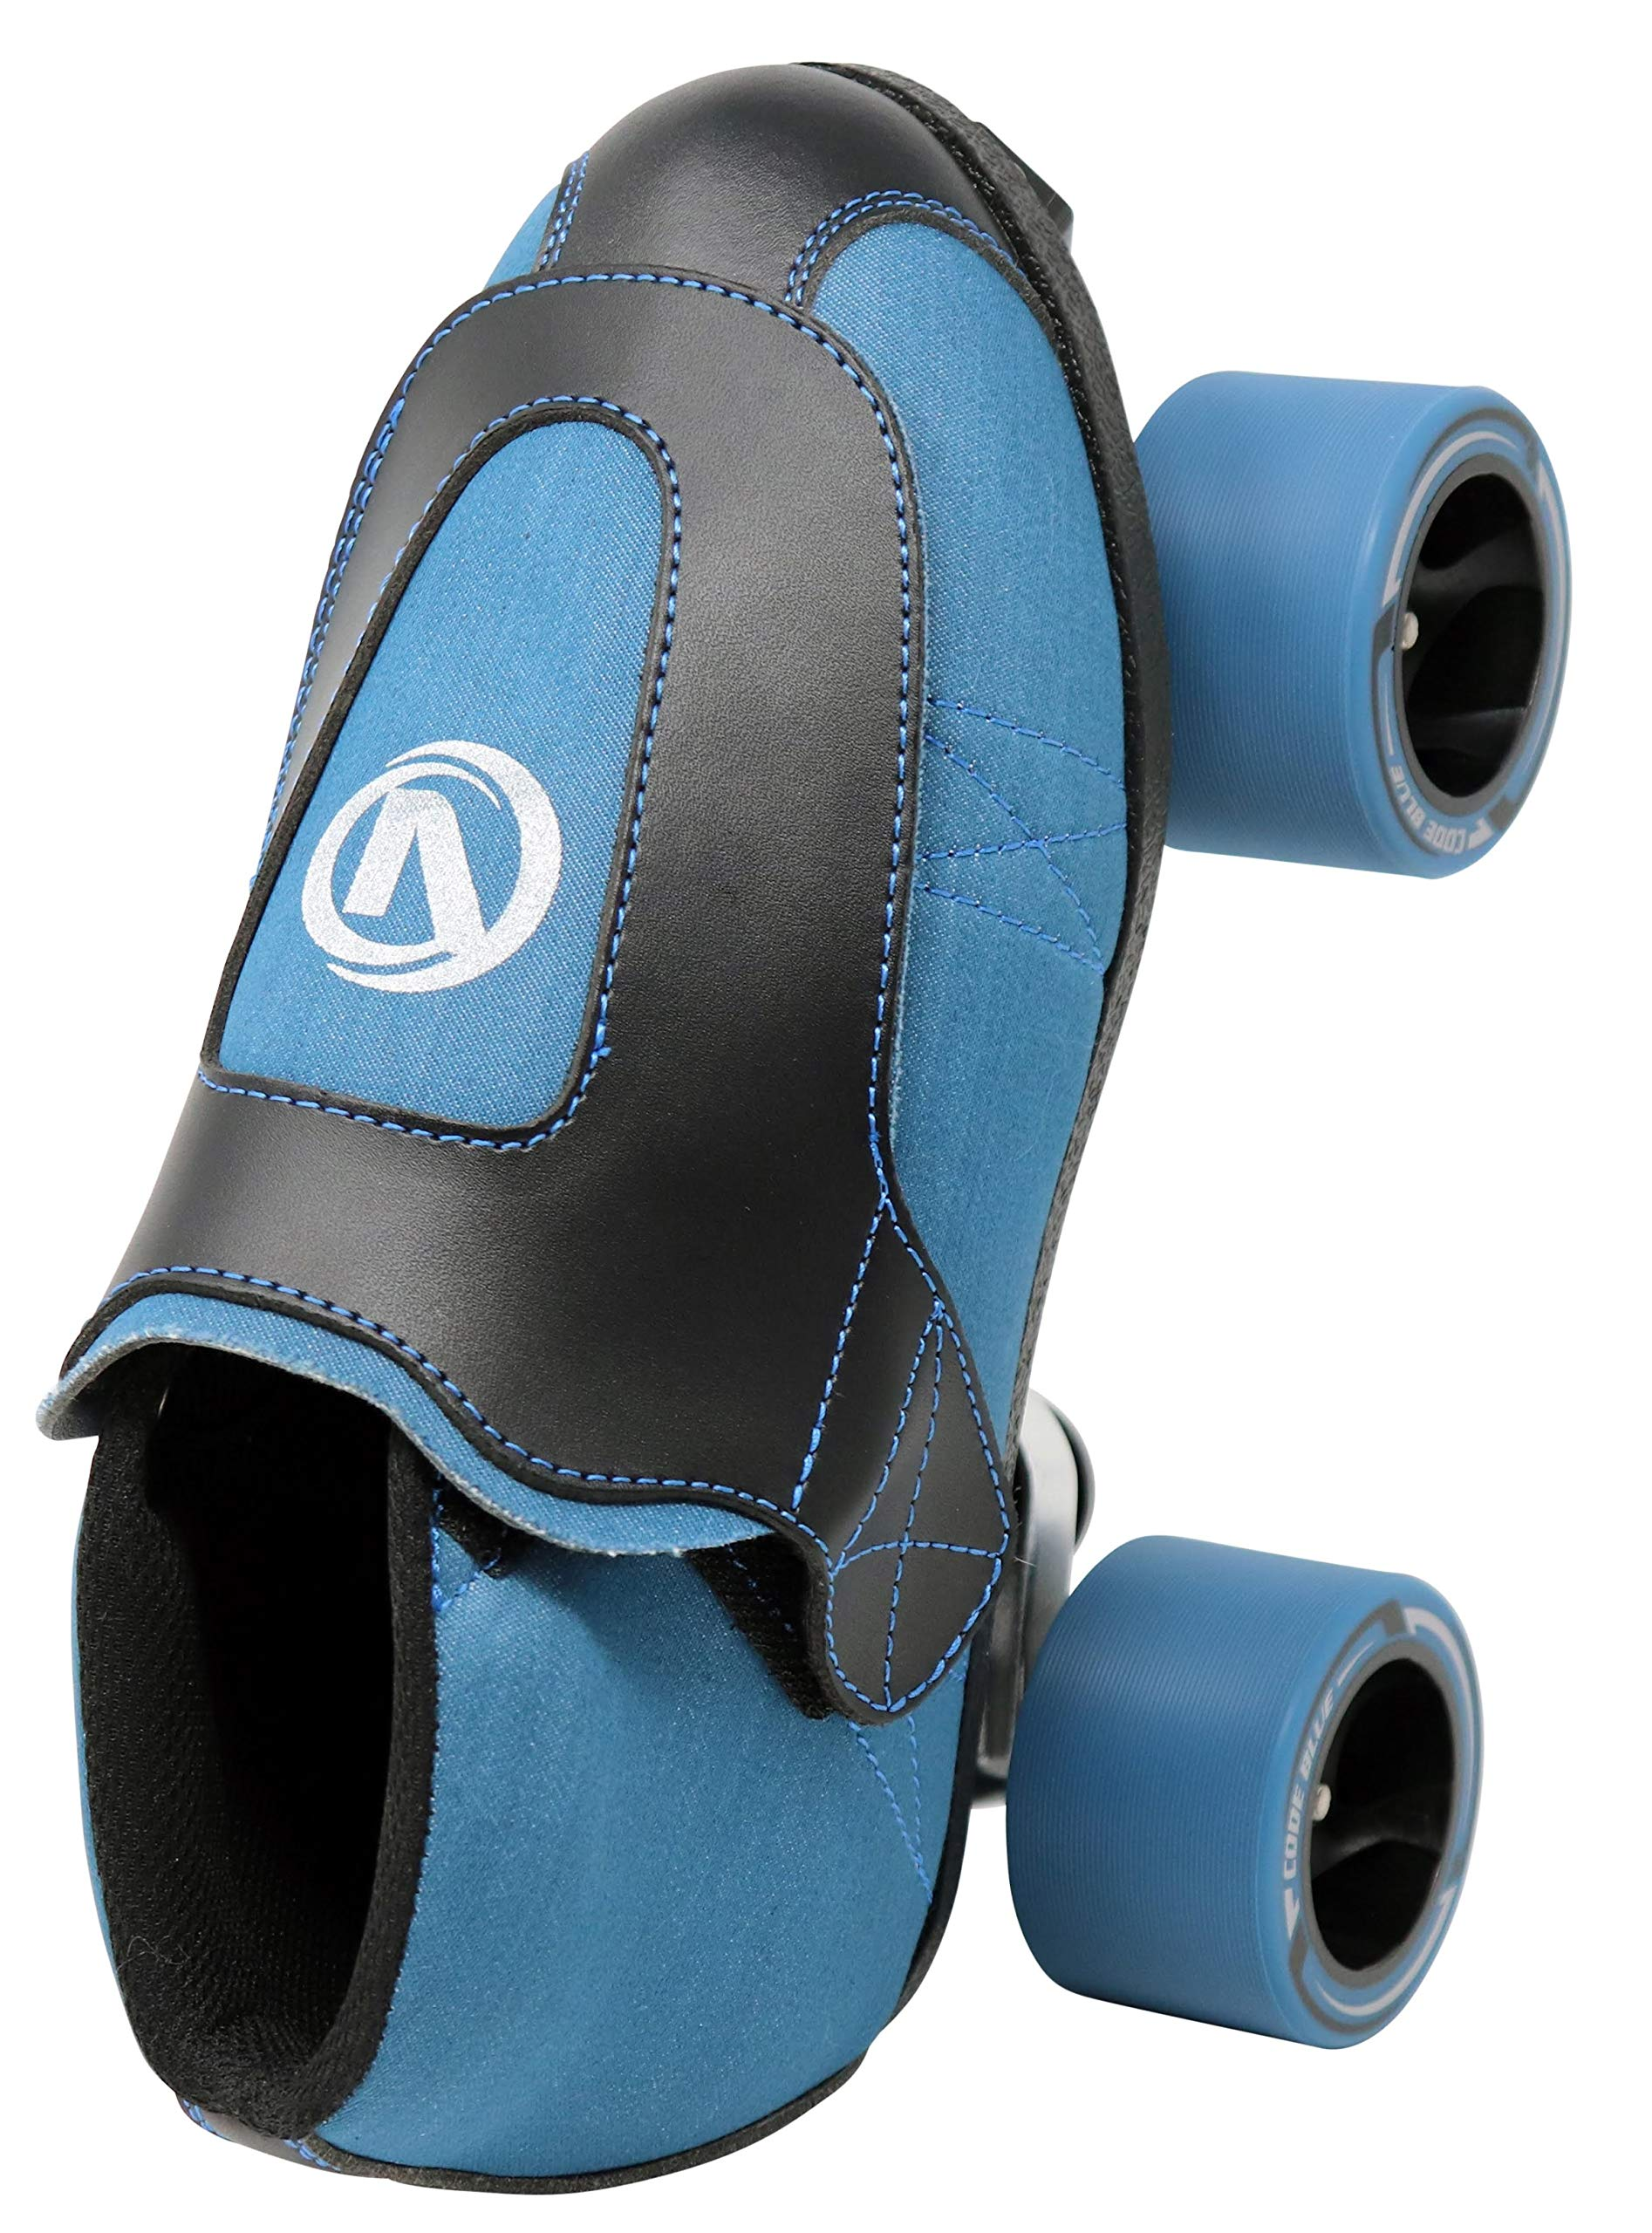 VNLA Code Blue Jam Skate - Mens & Womens Speed Skates - Quad Skates for Women & Men - Adjustable Roller Skate/Rollerskates - Outdoor & Indoor Adult Quad Skate - Kid/Kids Roller Skates (Size 8) by VNLA (Image #4)